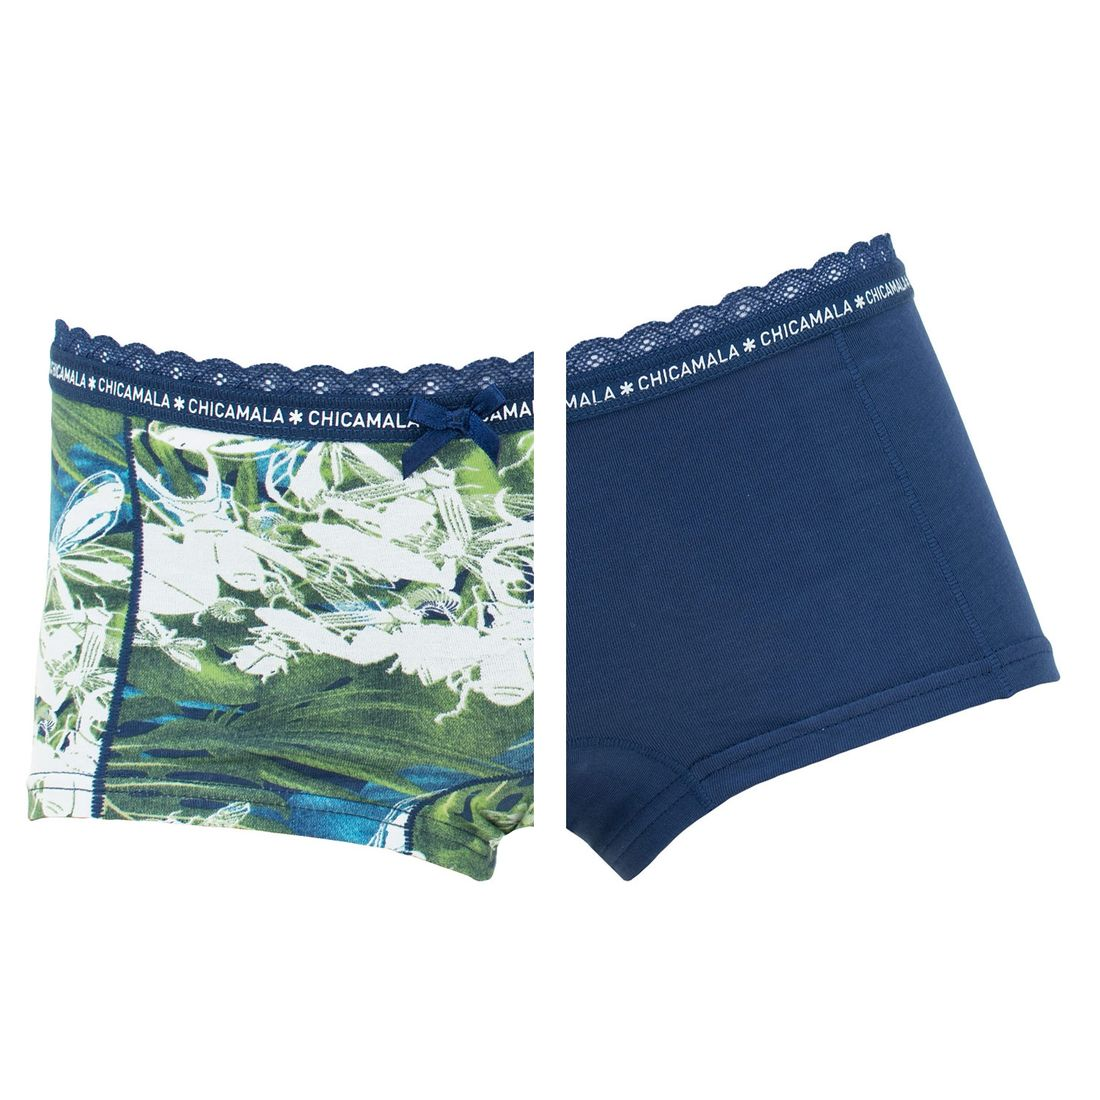 Afbeelding van Sale: Chicamala boxers meisjes kant 2 pack buggin around